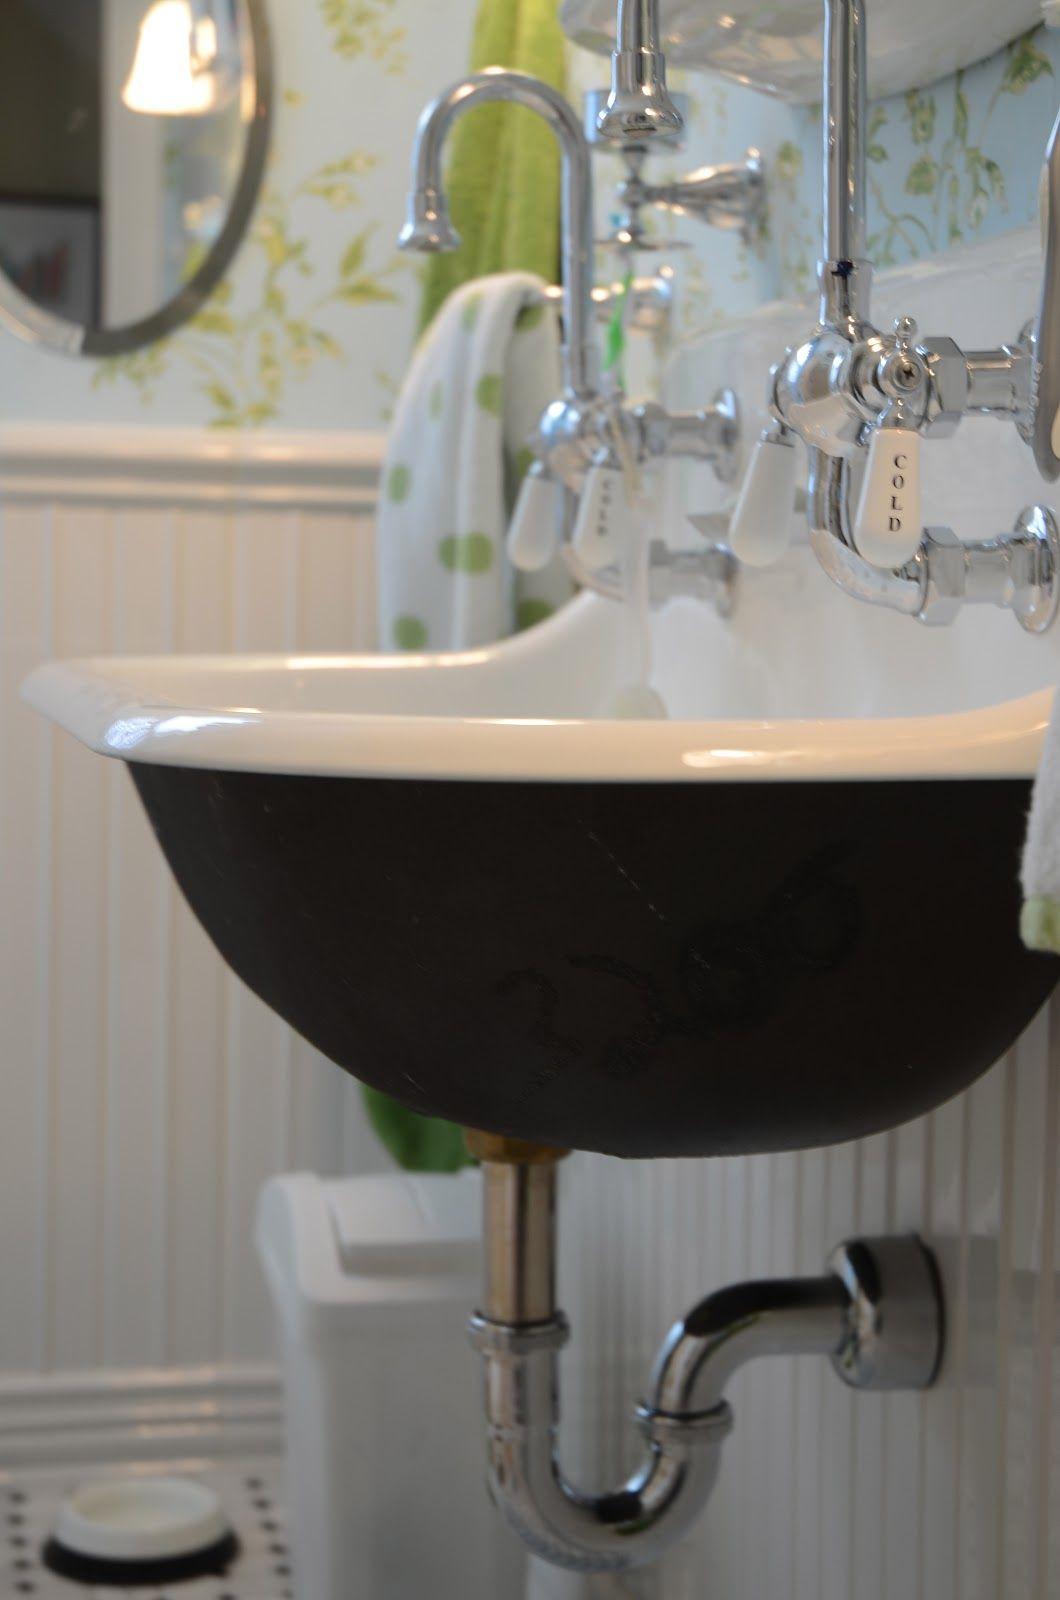 Sophisticated Single Faucet Trough Sink Gallery - Exterior ideas 3D ...